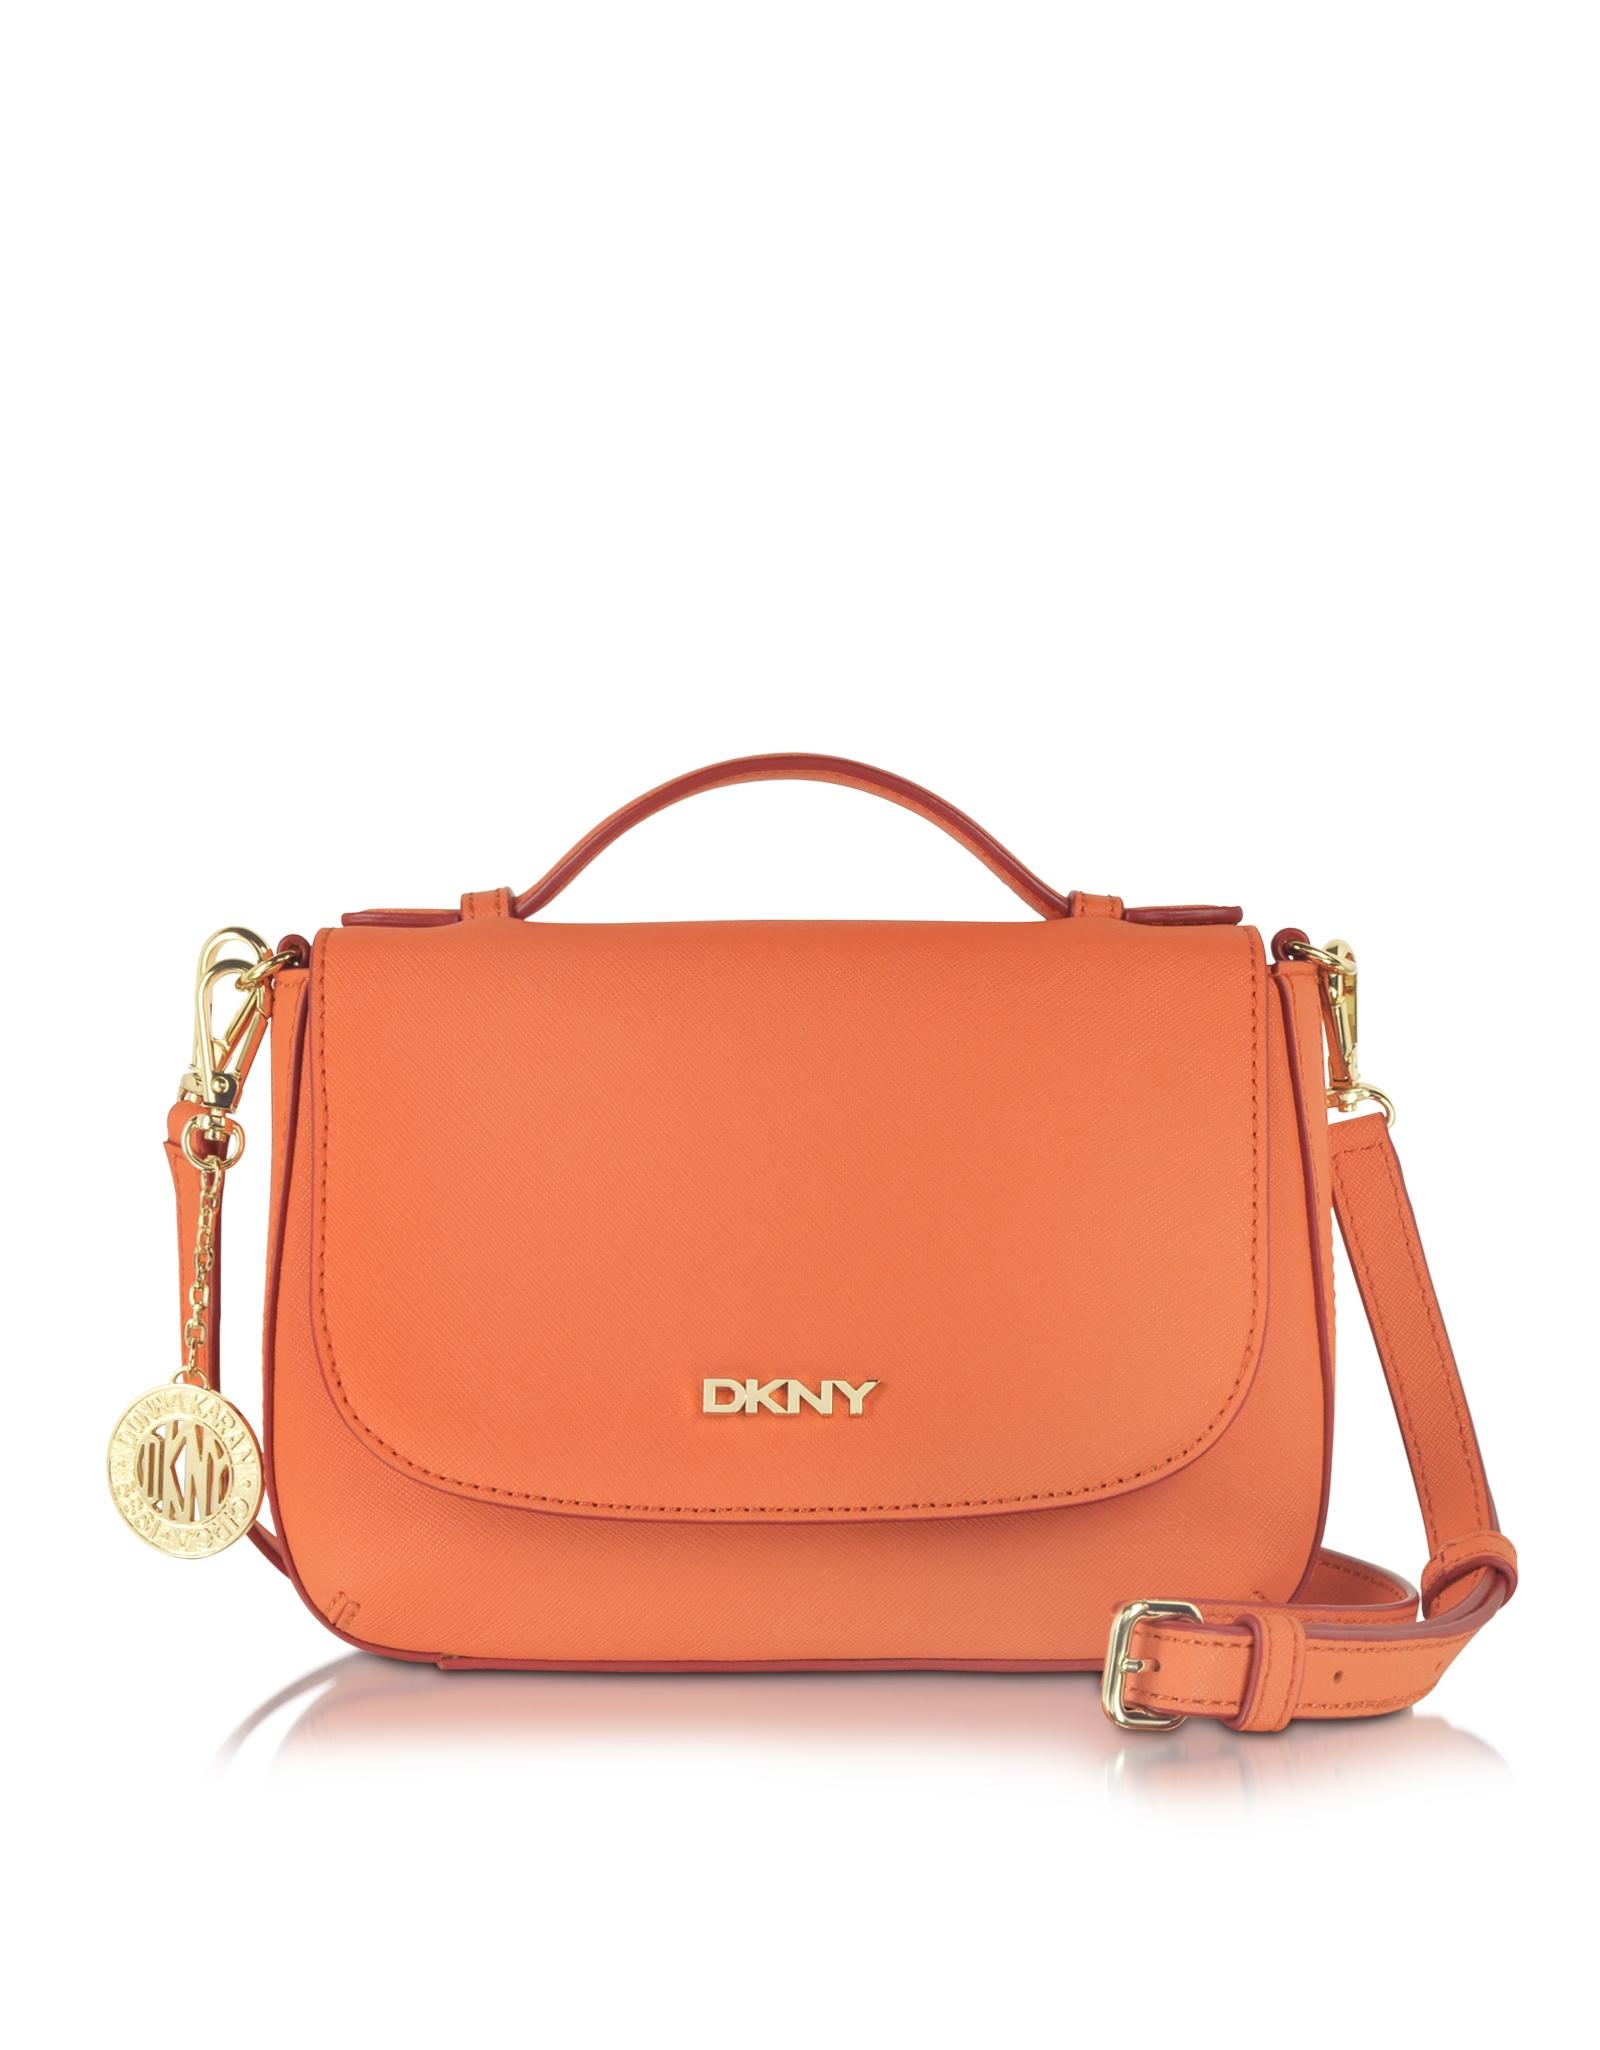 455405f7403 Lyst - DKNY Bryant Park Saffiano Leather Top Handle Crossbody in Orange